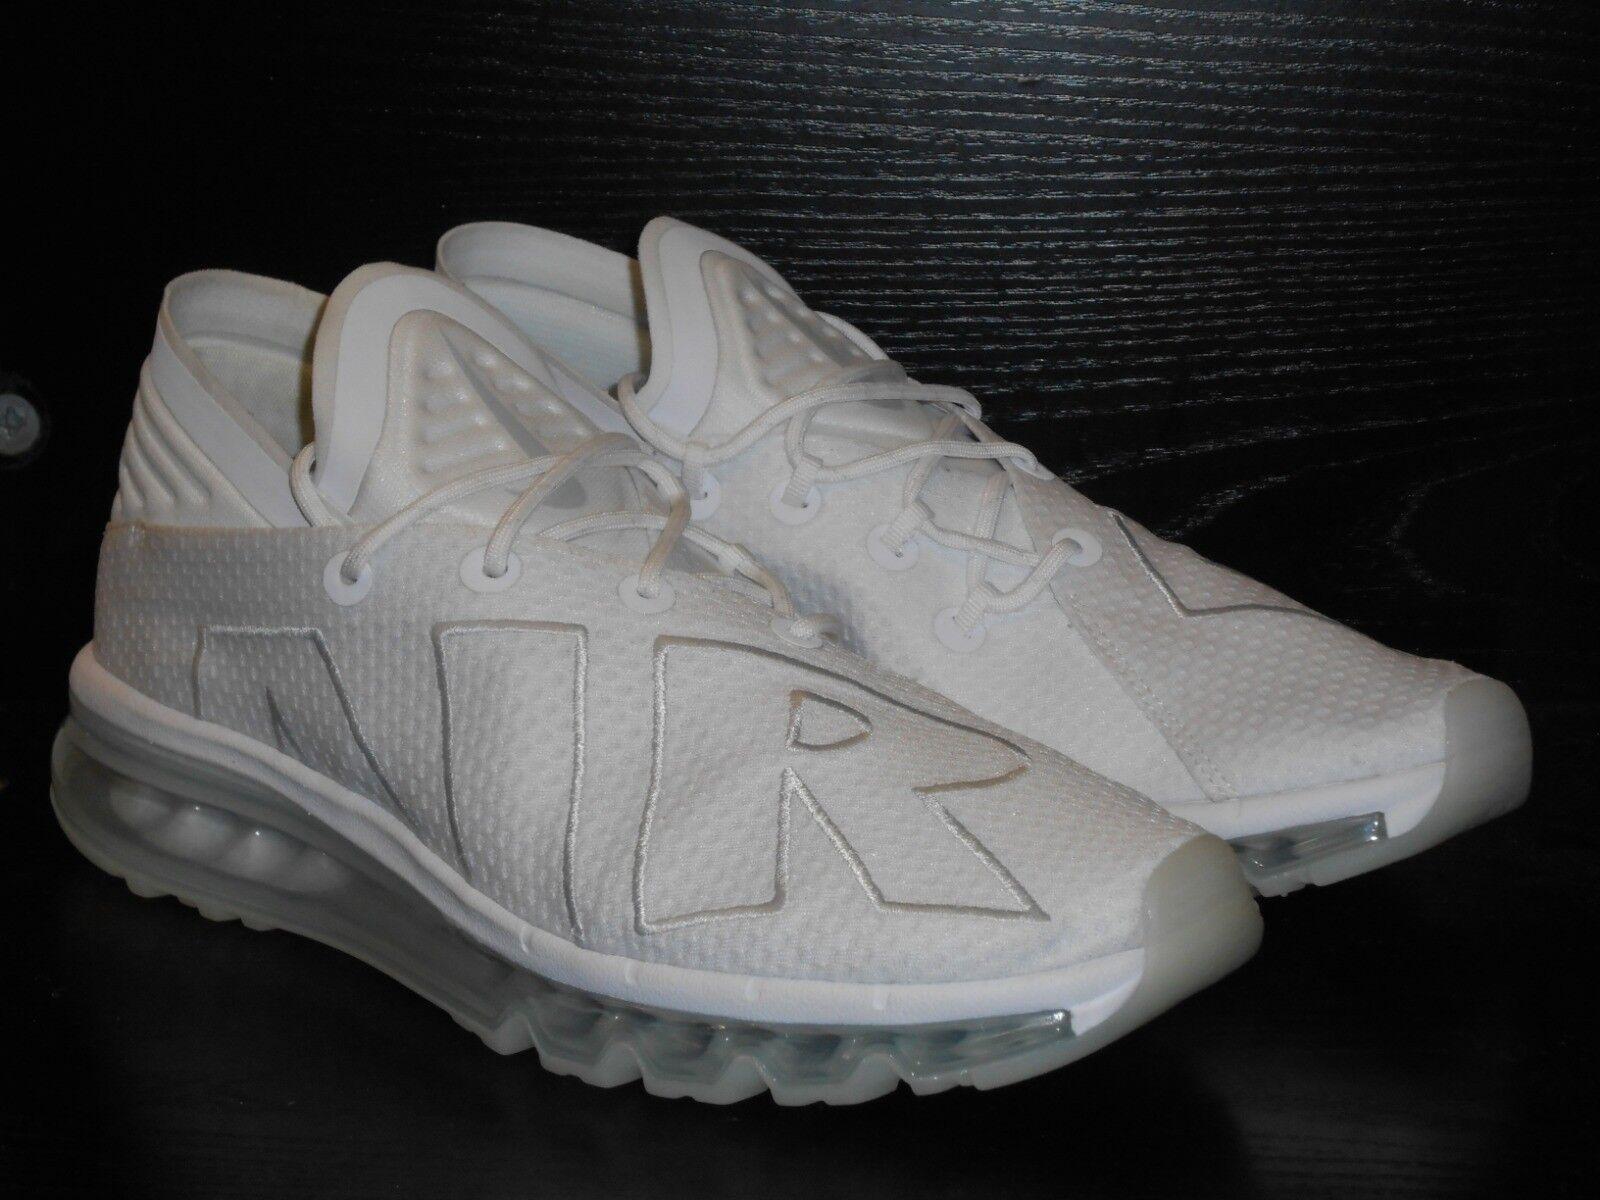 nike air max flair   en blanc entraîneur entraîneur blanc chaussure taille 8 cours 0b6b98